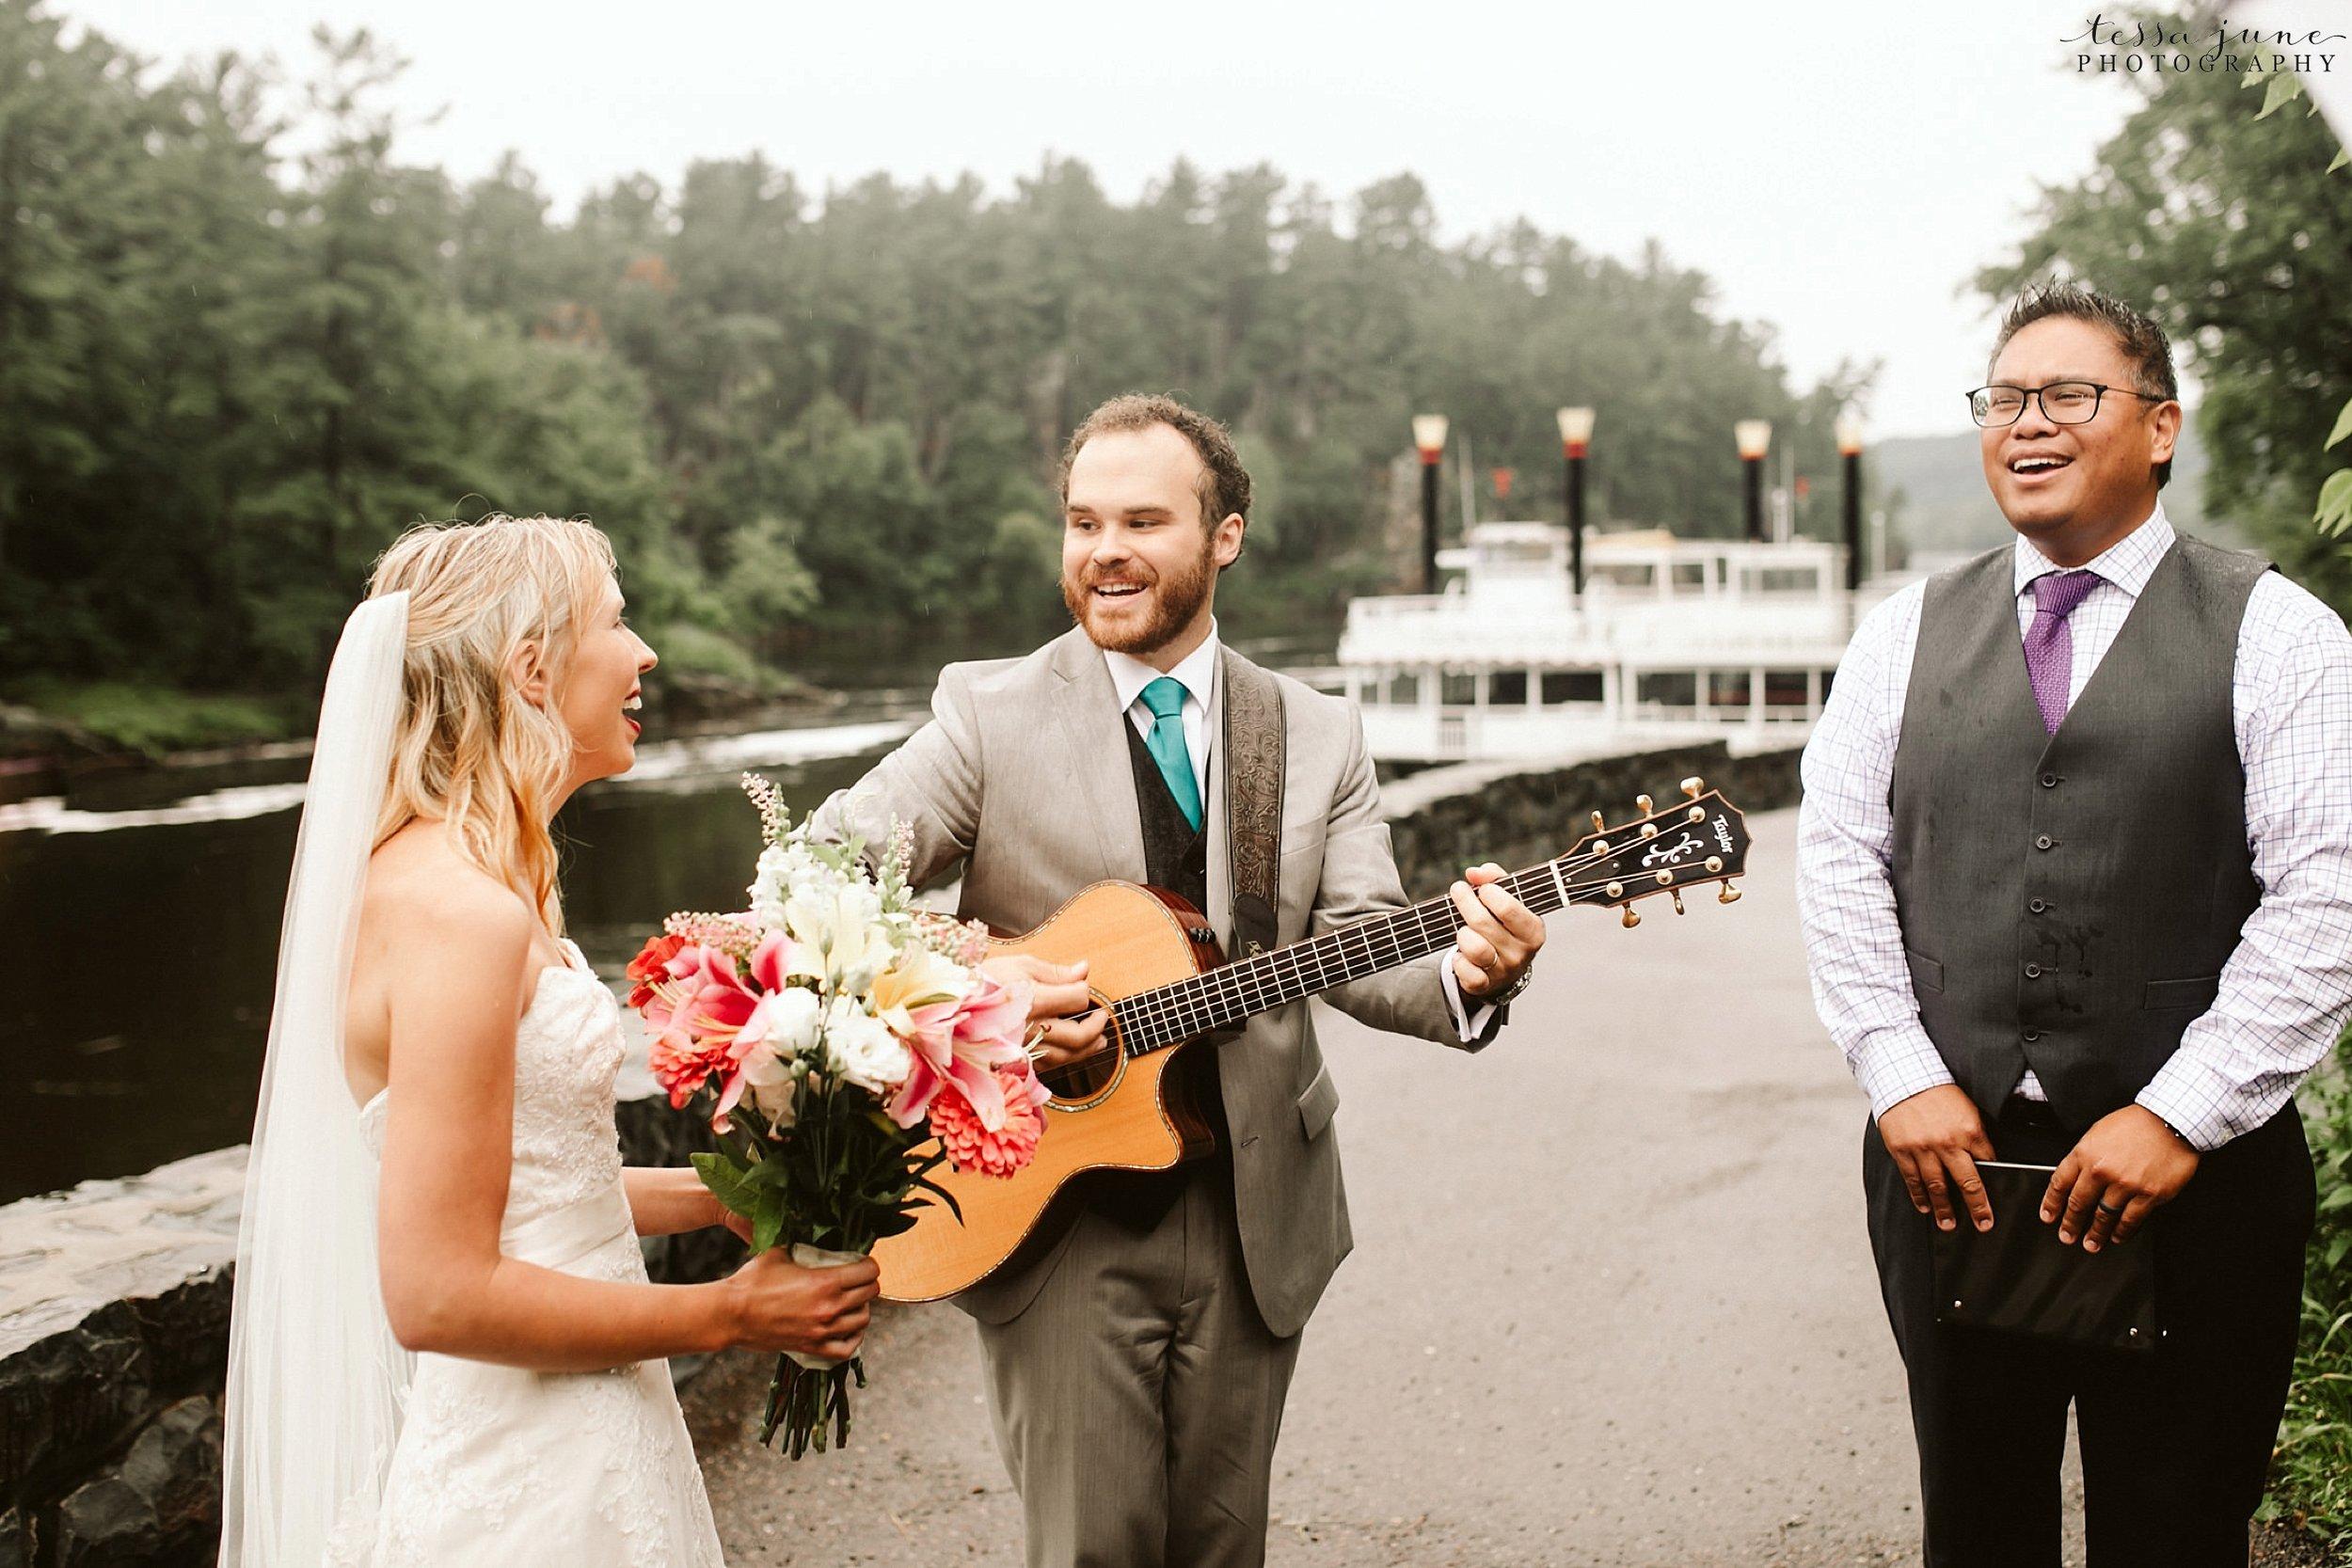 taylors-falls-rainy-elopement-wedding-interstate-state-park-67.jpg